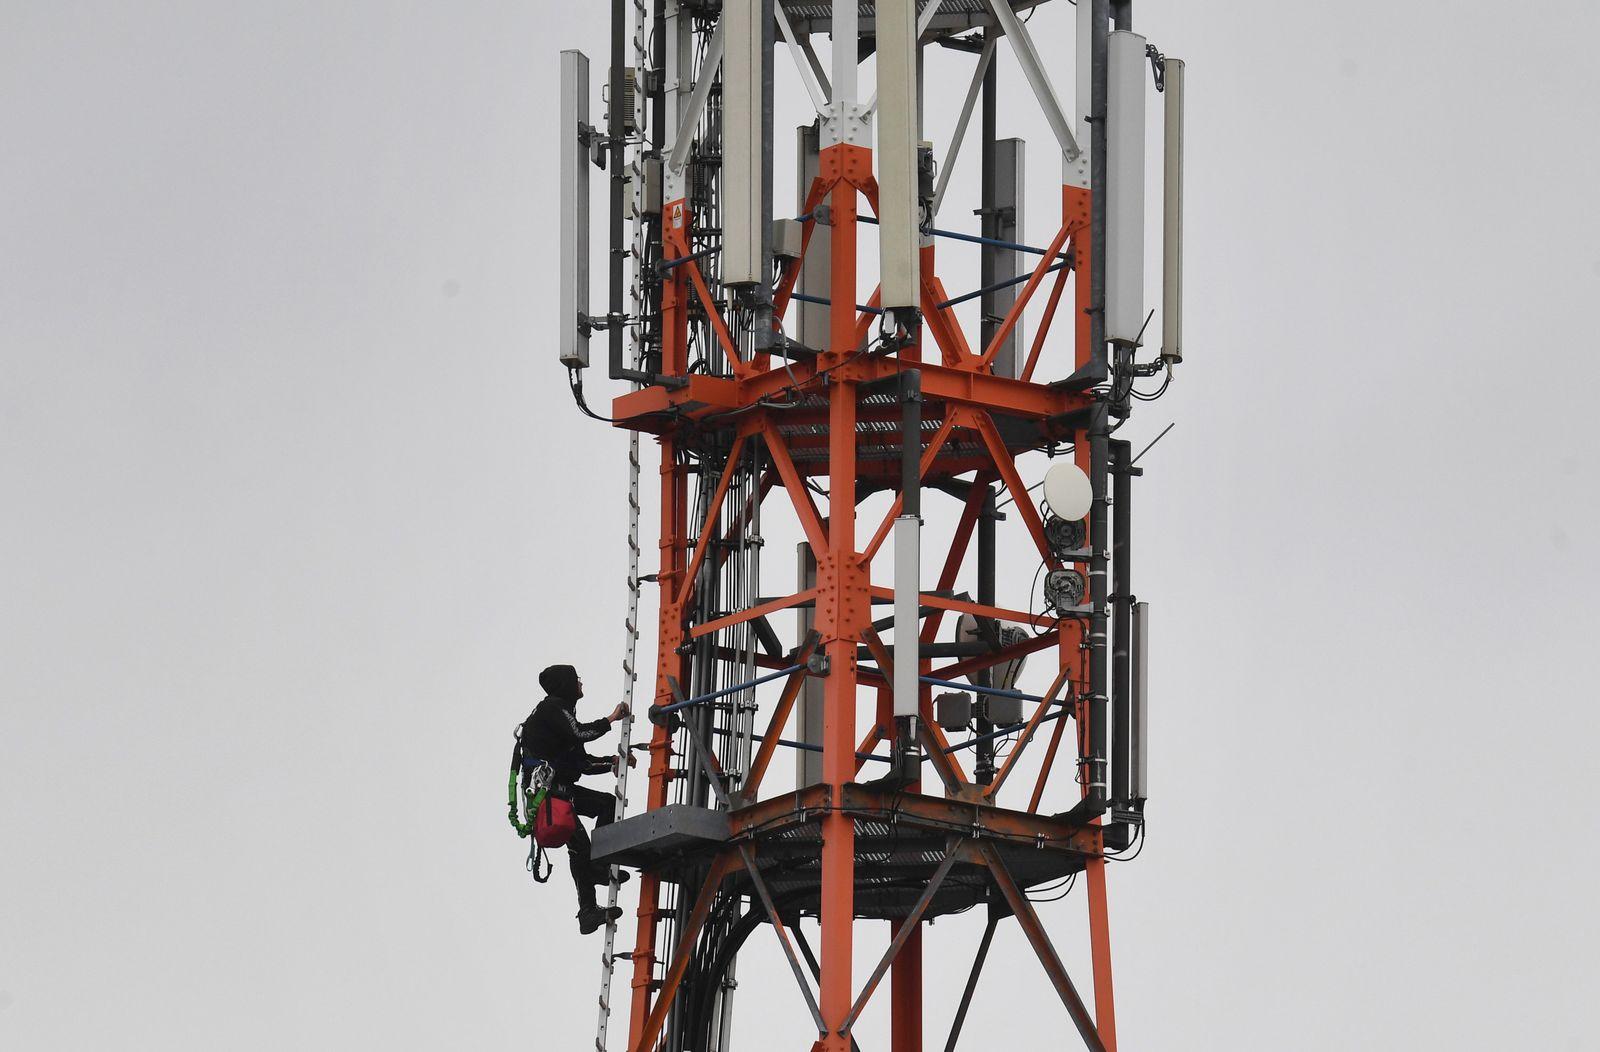 Mobilfunkmast Vodafone 5G